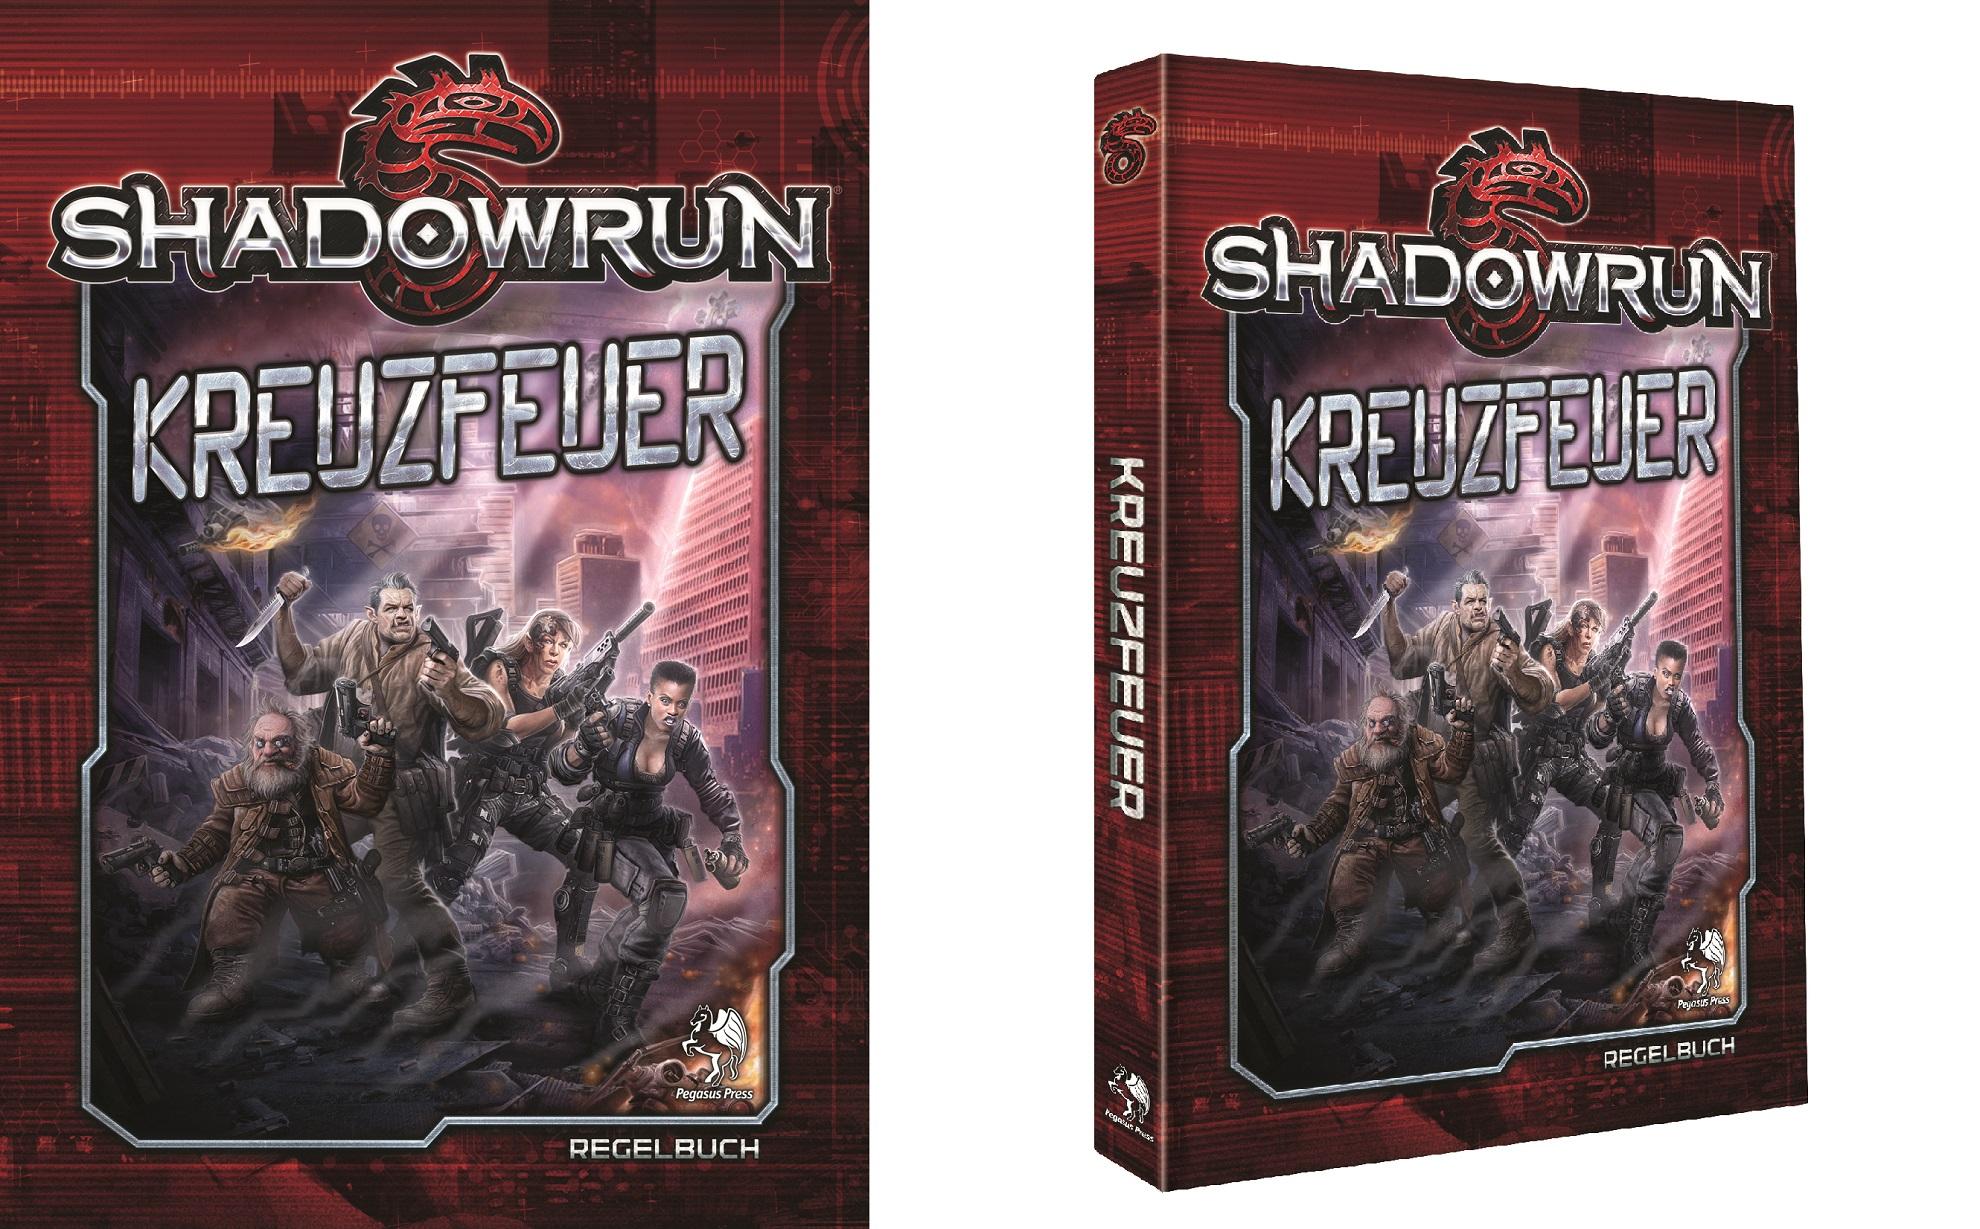 shadowrun 5 toxine)